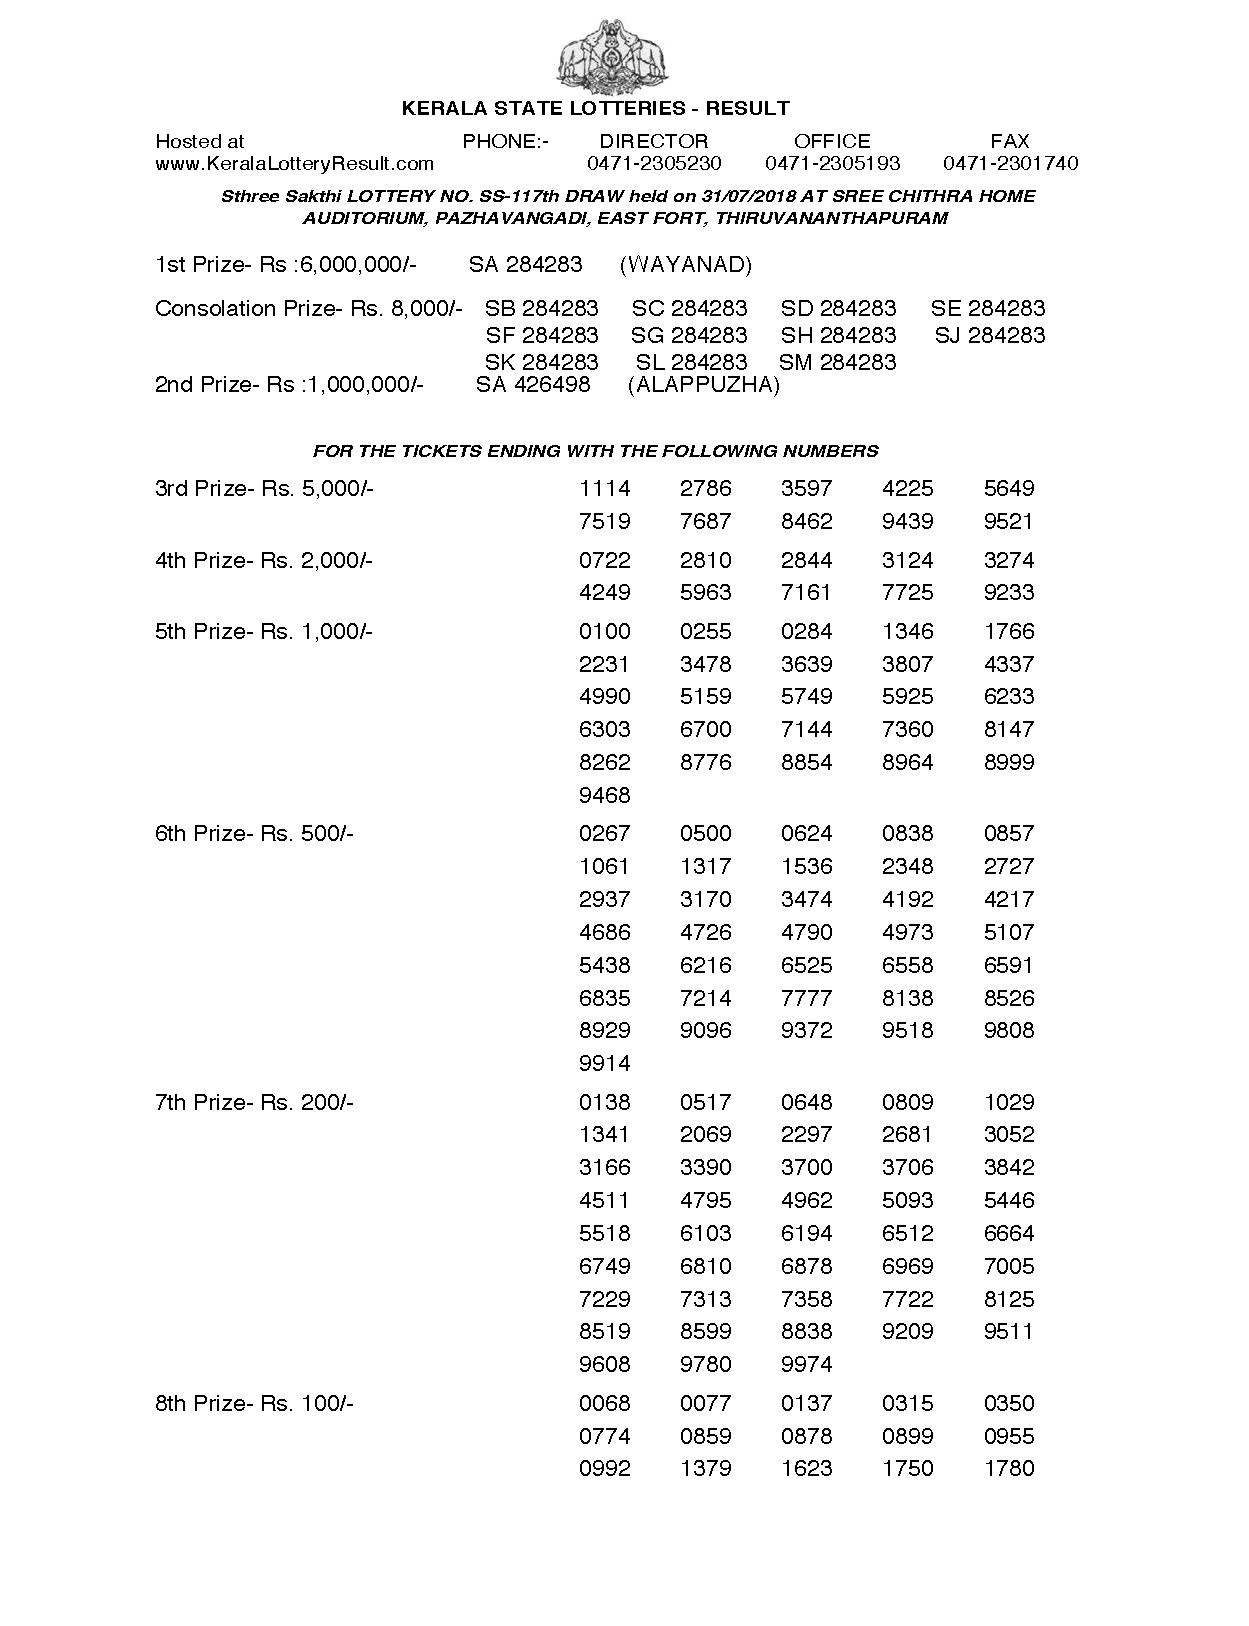 Sthree Sakthi SS117 Kerala Lottery Results Screenshot: Page 1